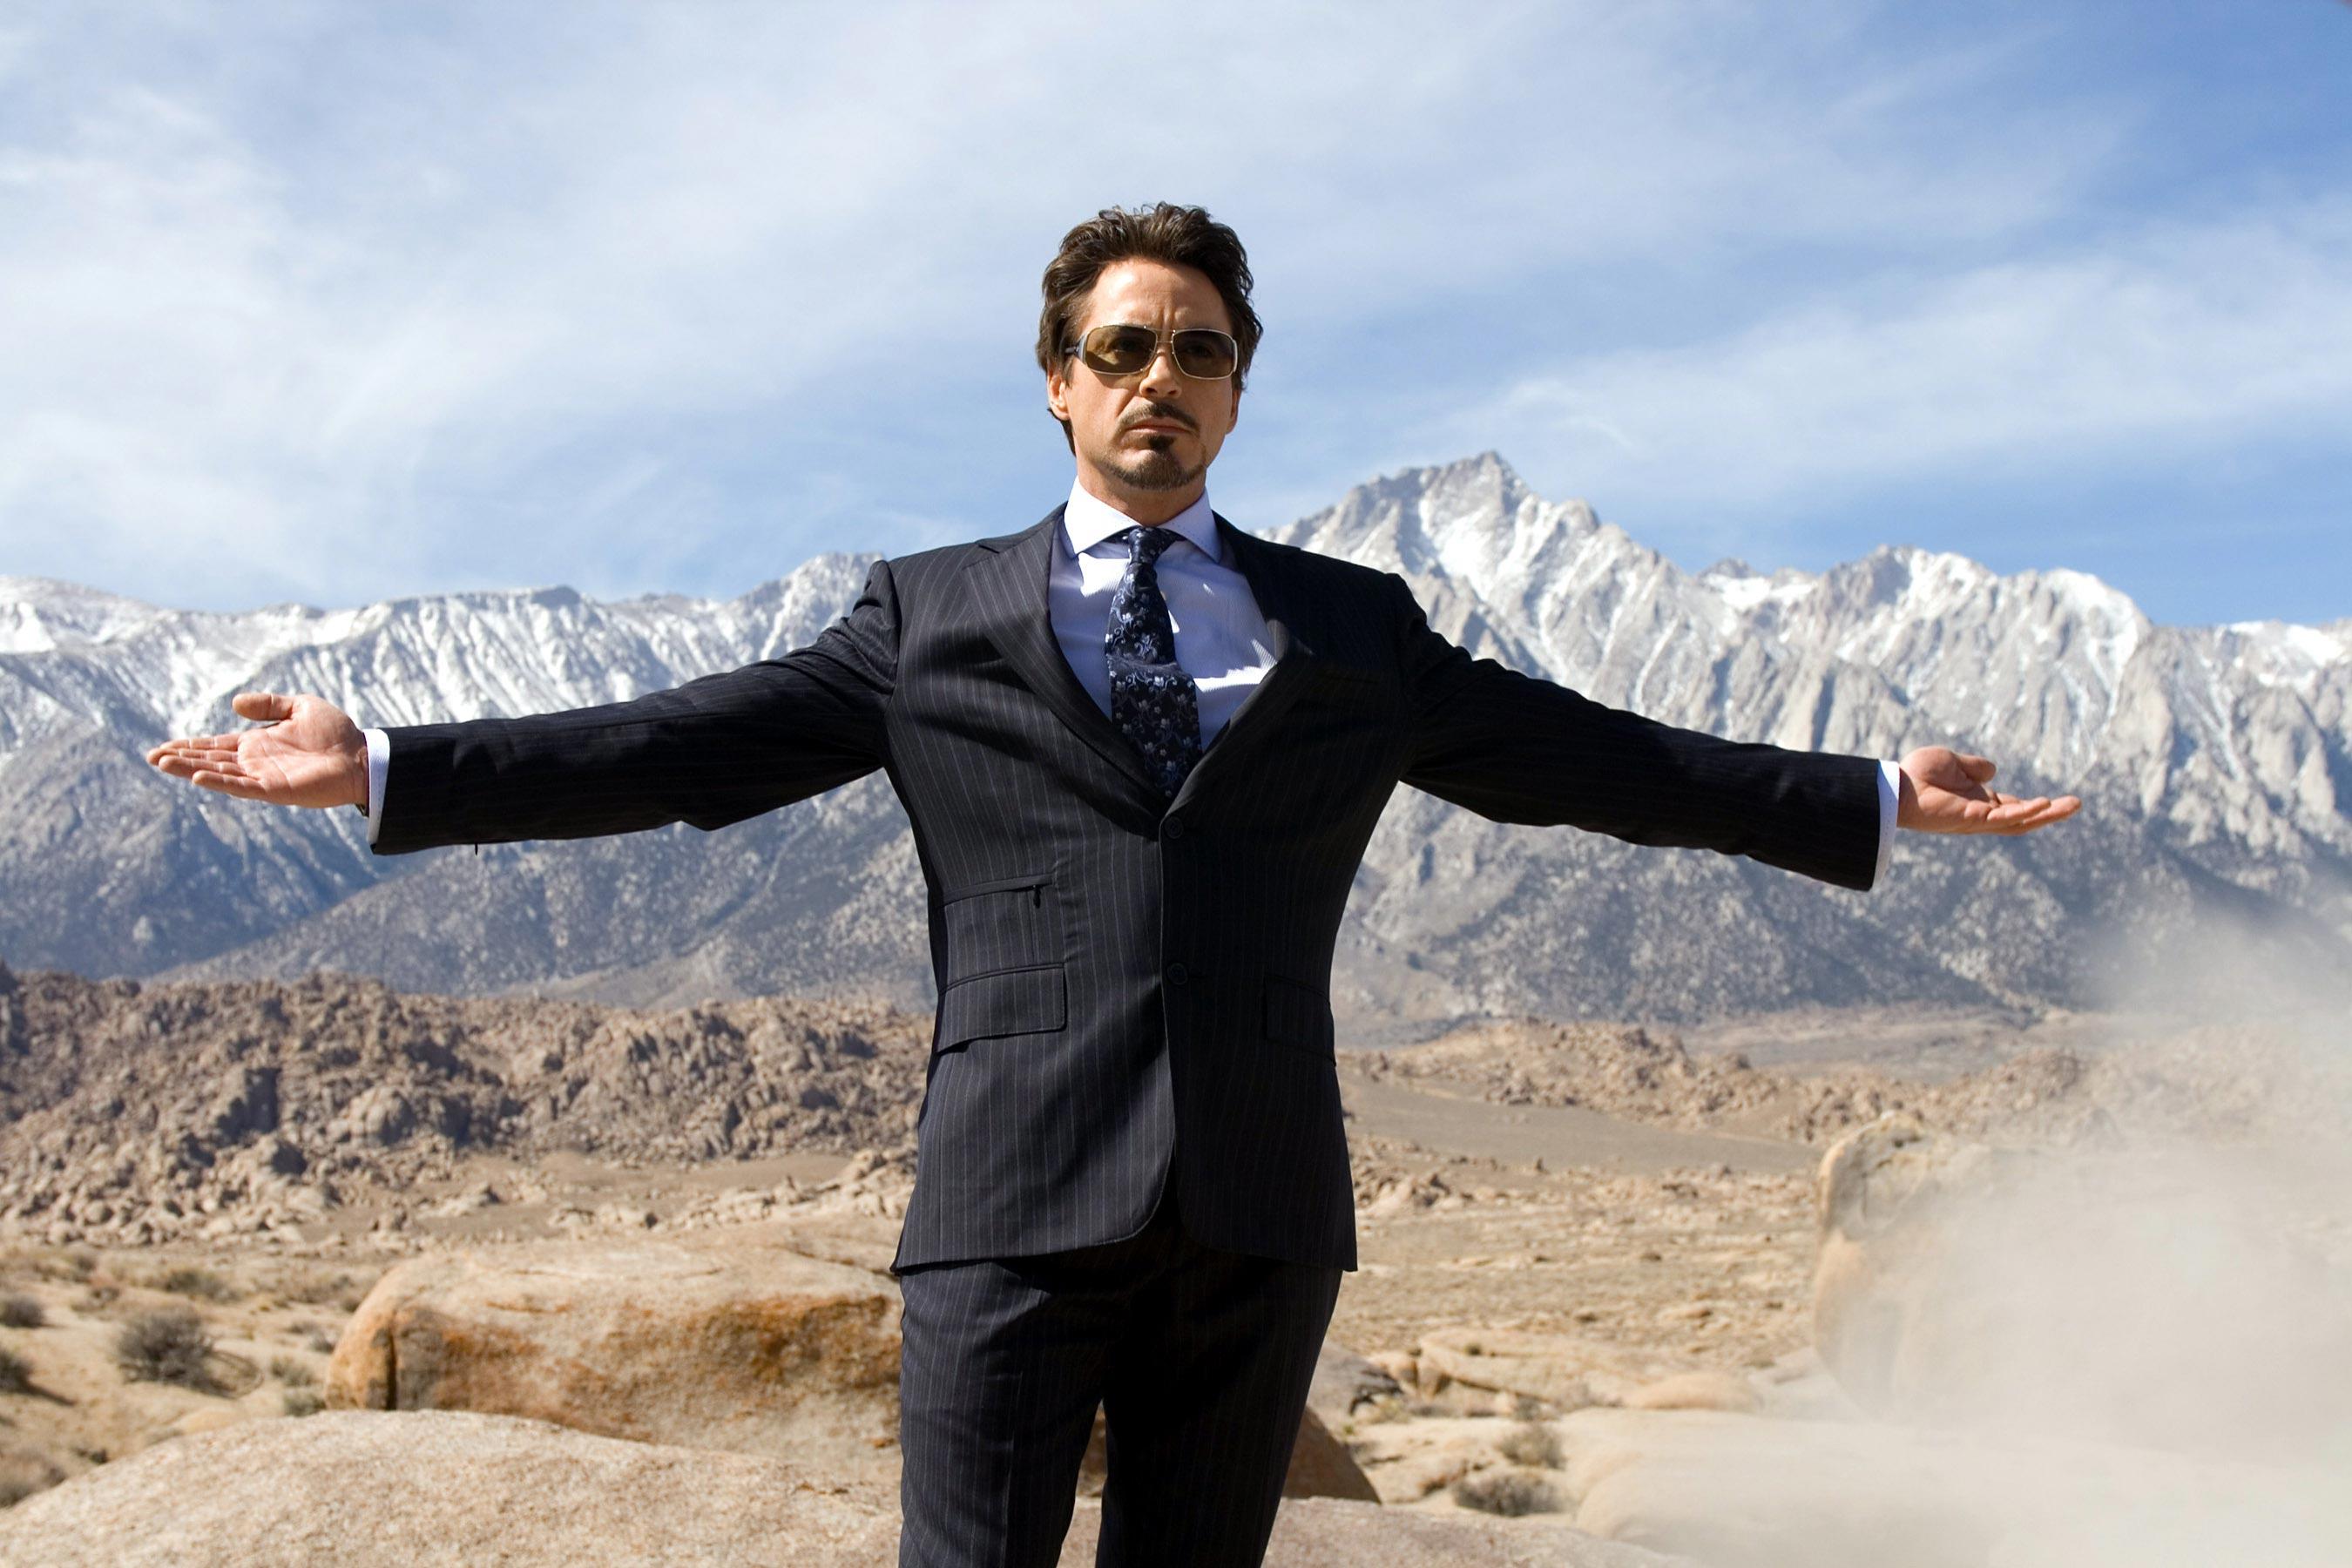 Robert Downey Jr《iron man》當年試鏡影片曝光,影迷淚灑:註定是Tony Stark